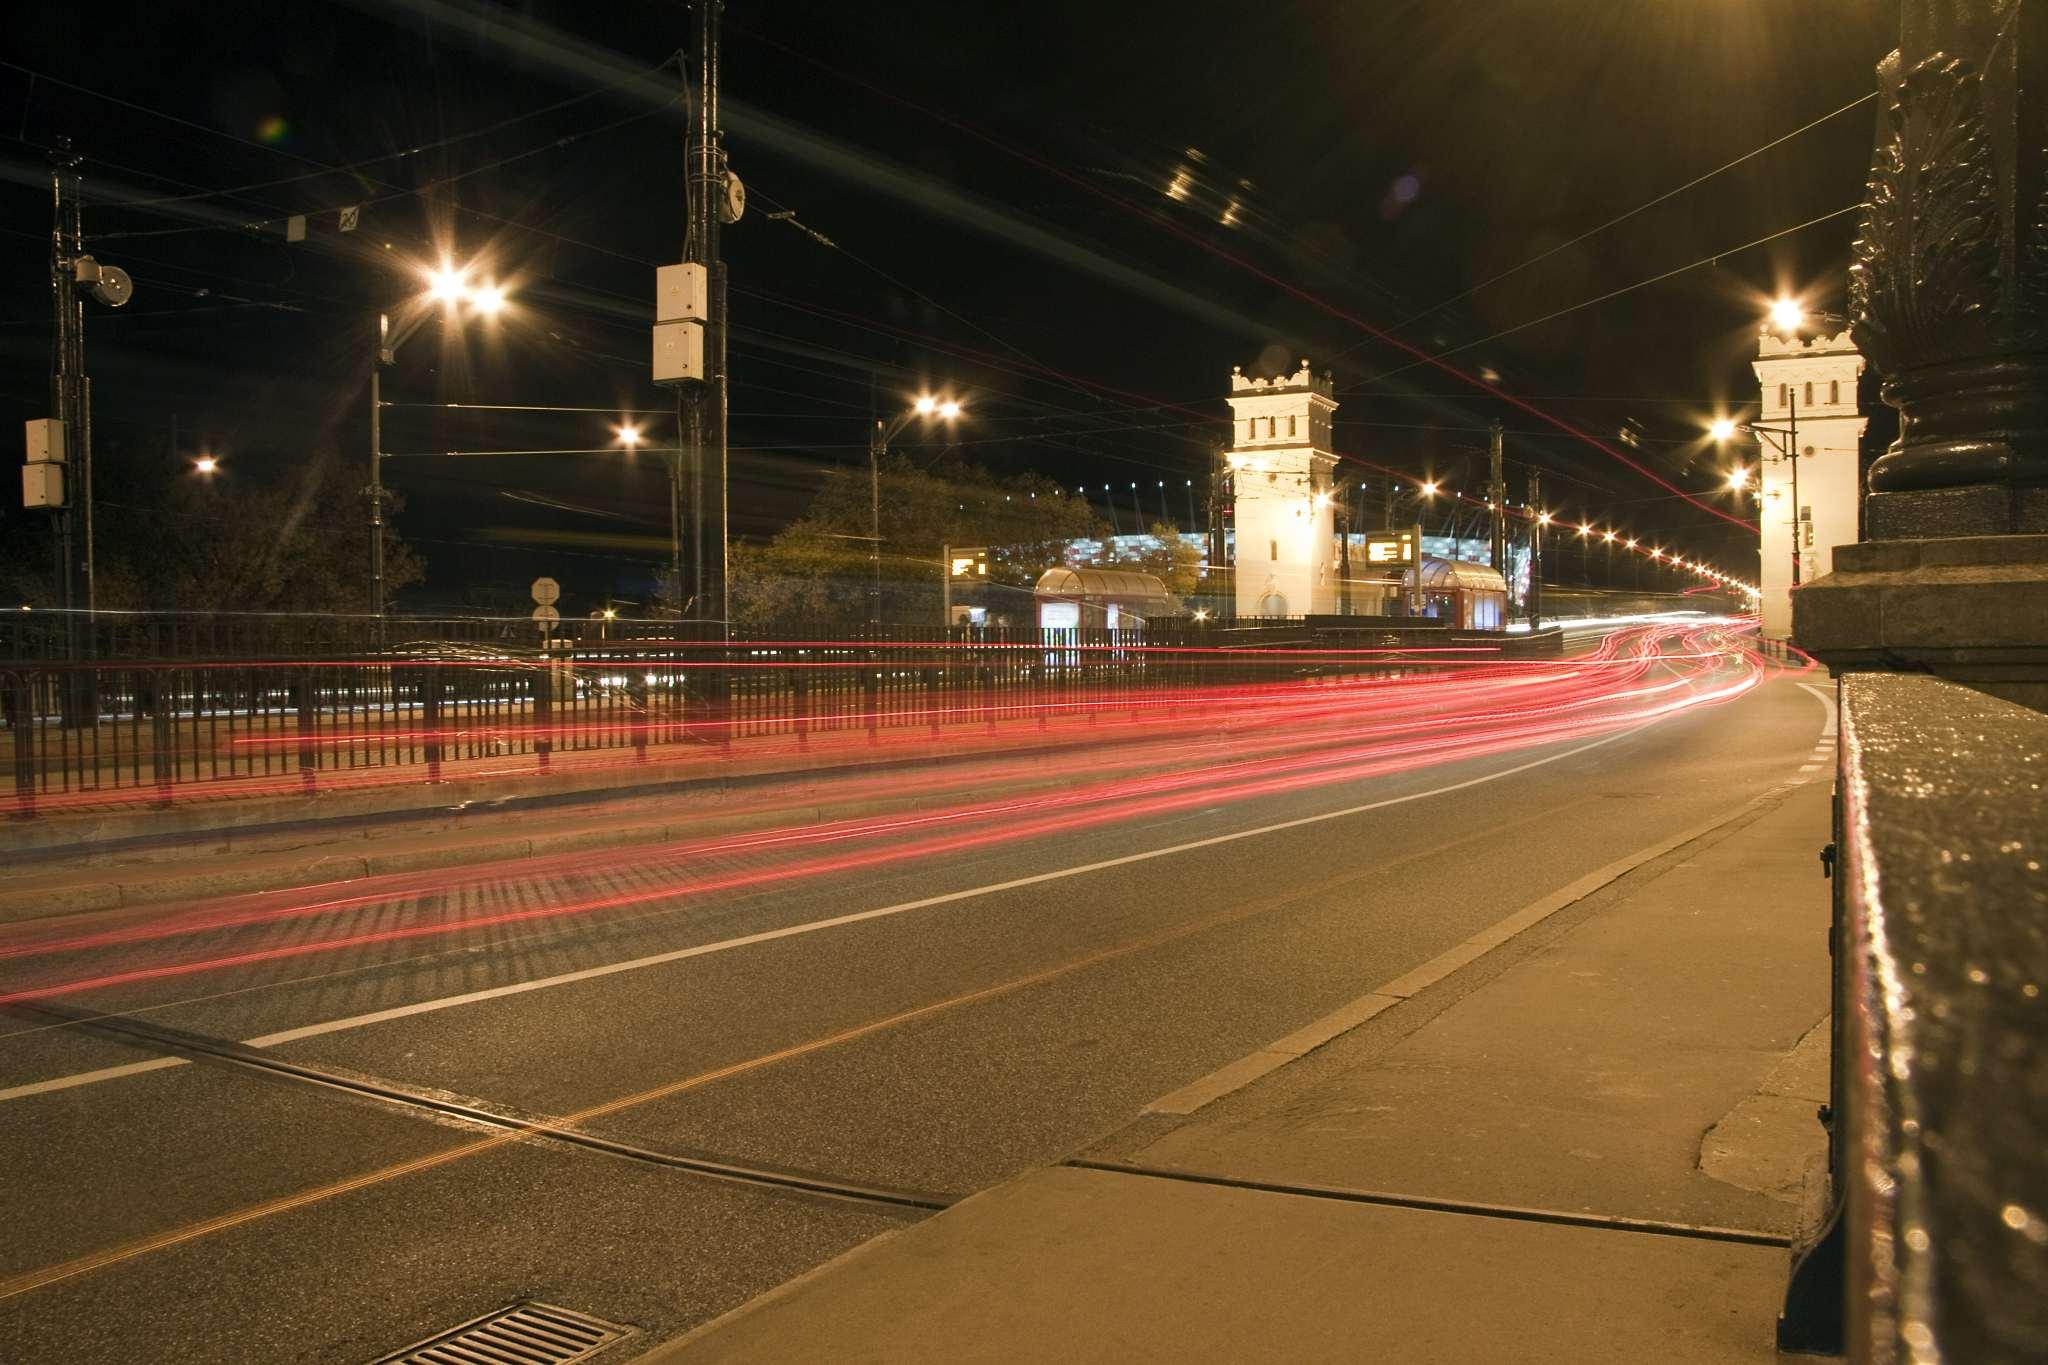 Zooming across the bridge